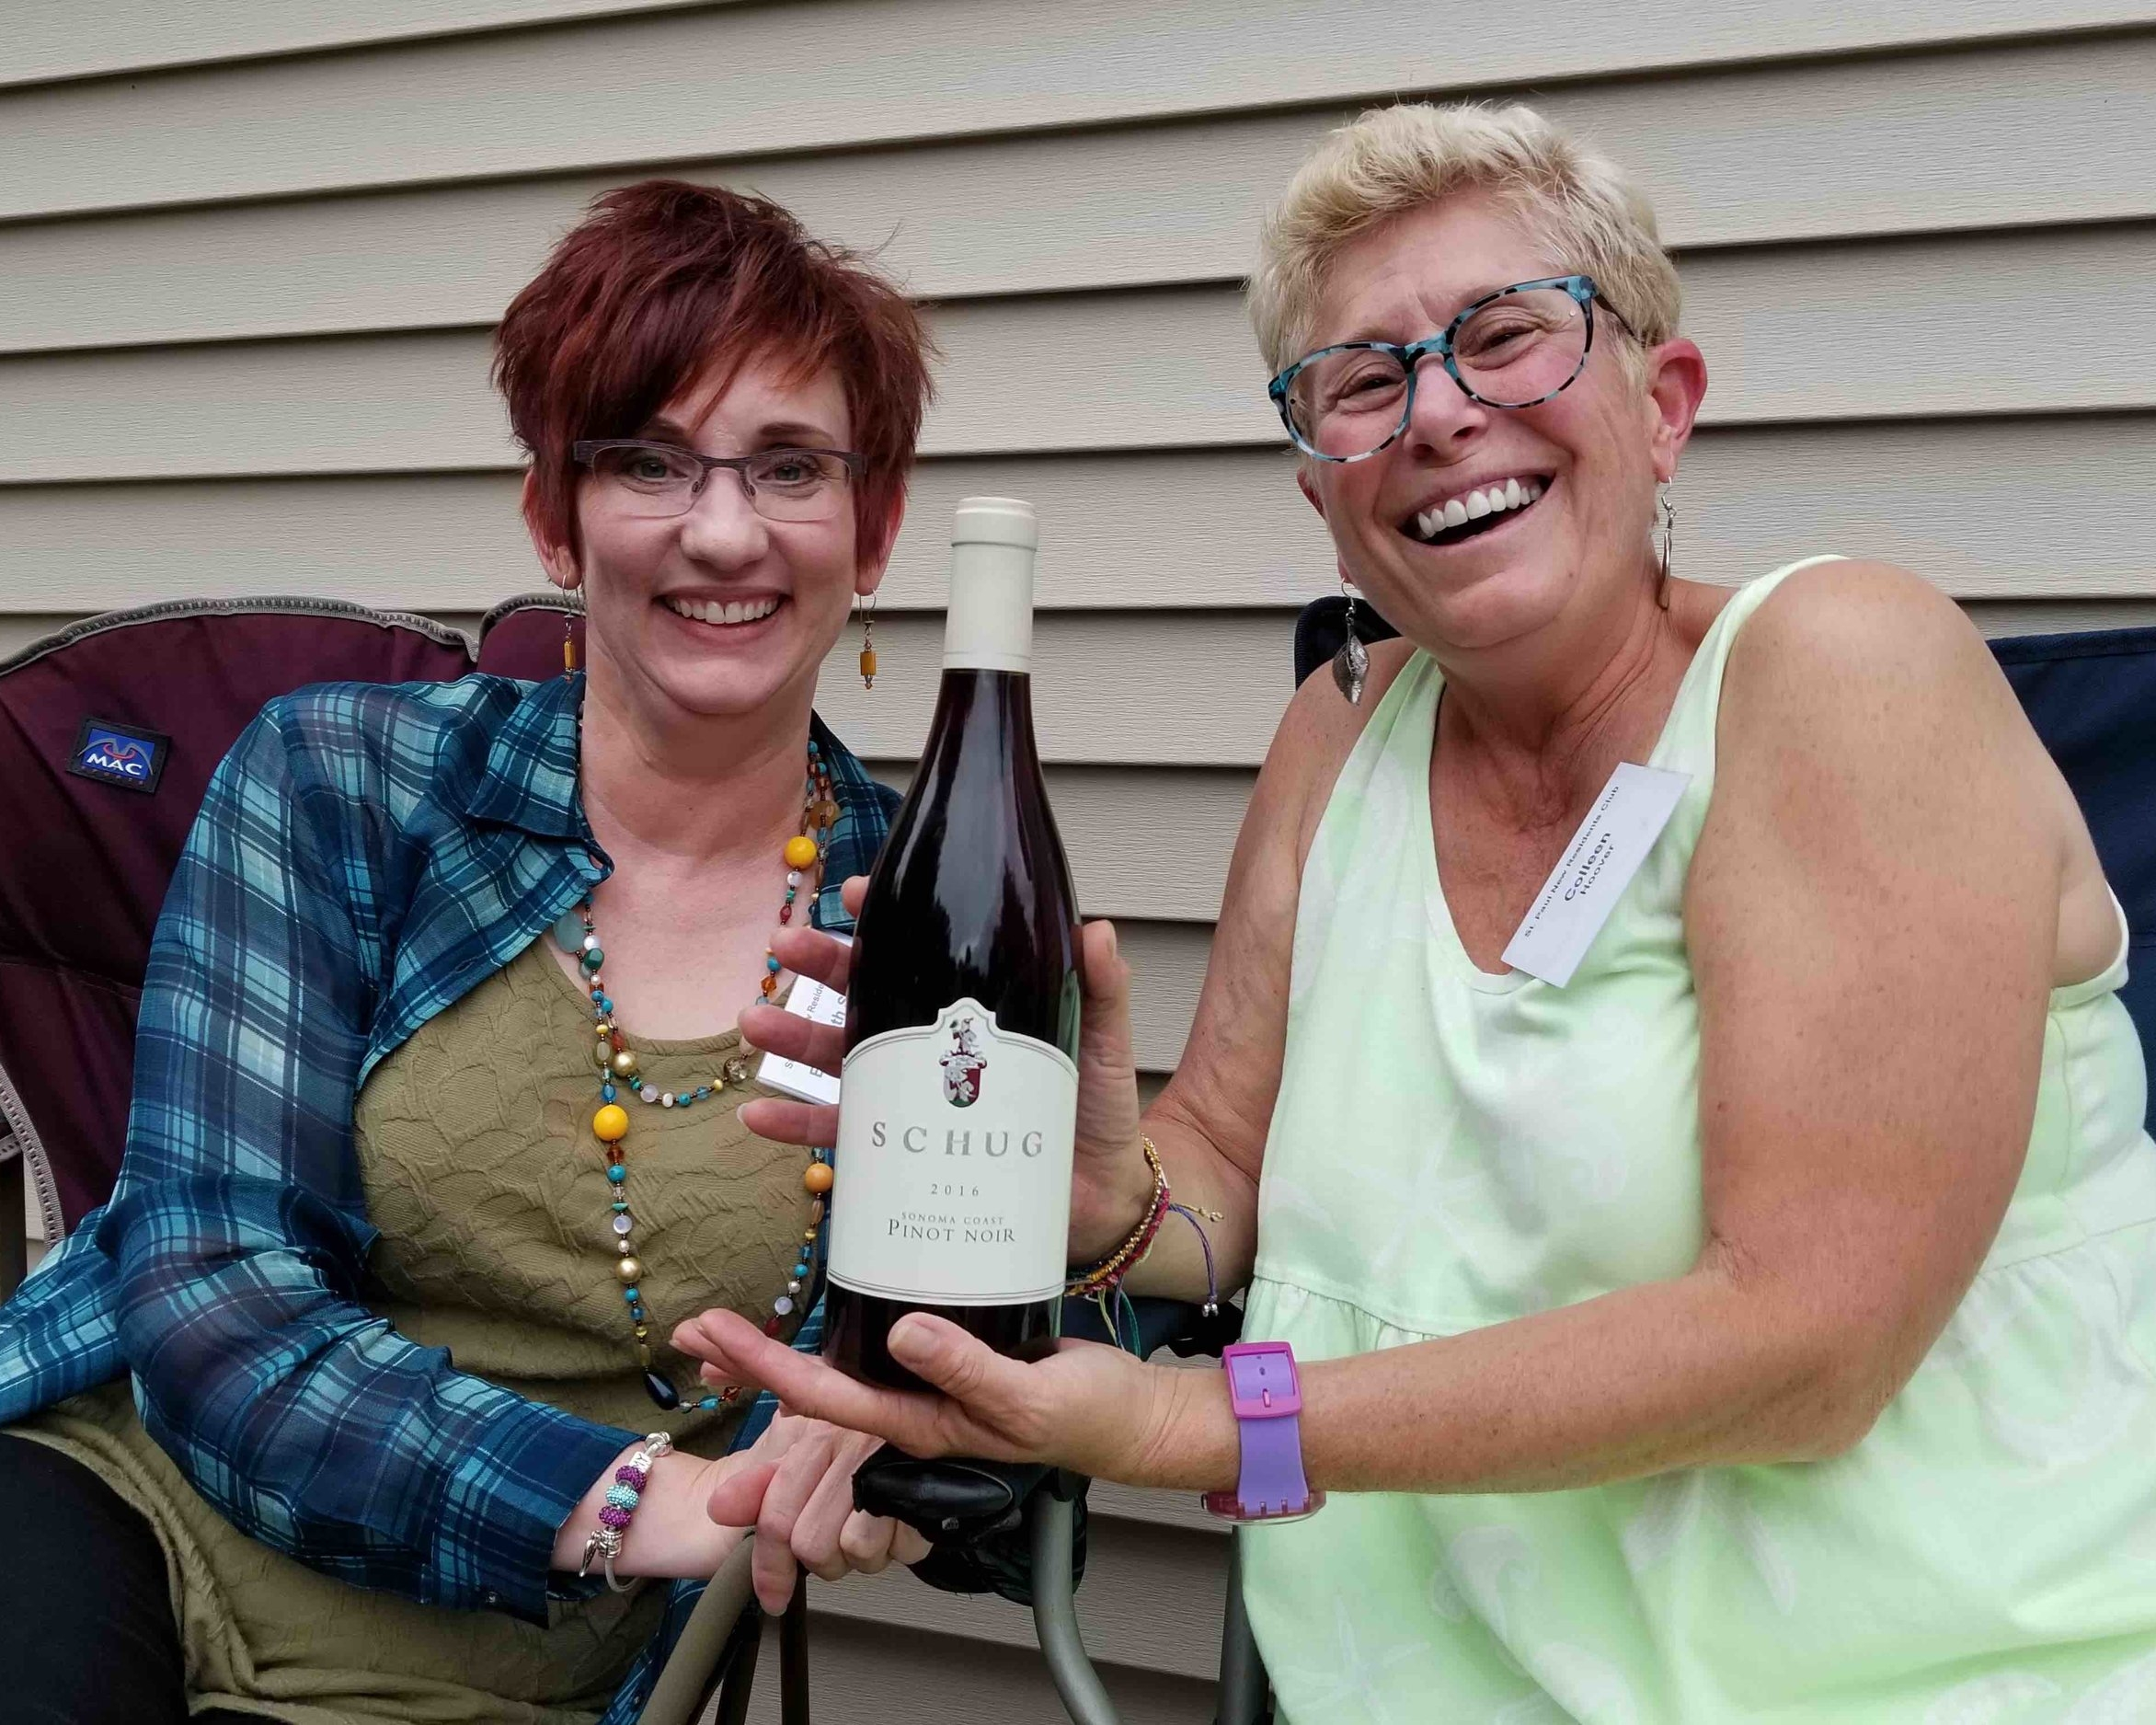 Elizabeth Colleen & Wine 2018-06-20 19.52.22 copy.jpg